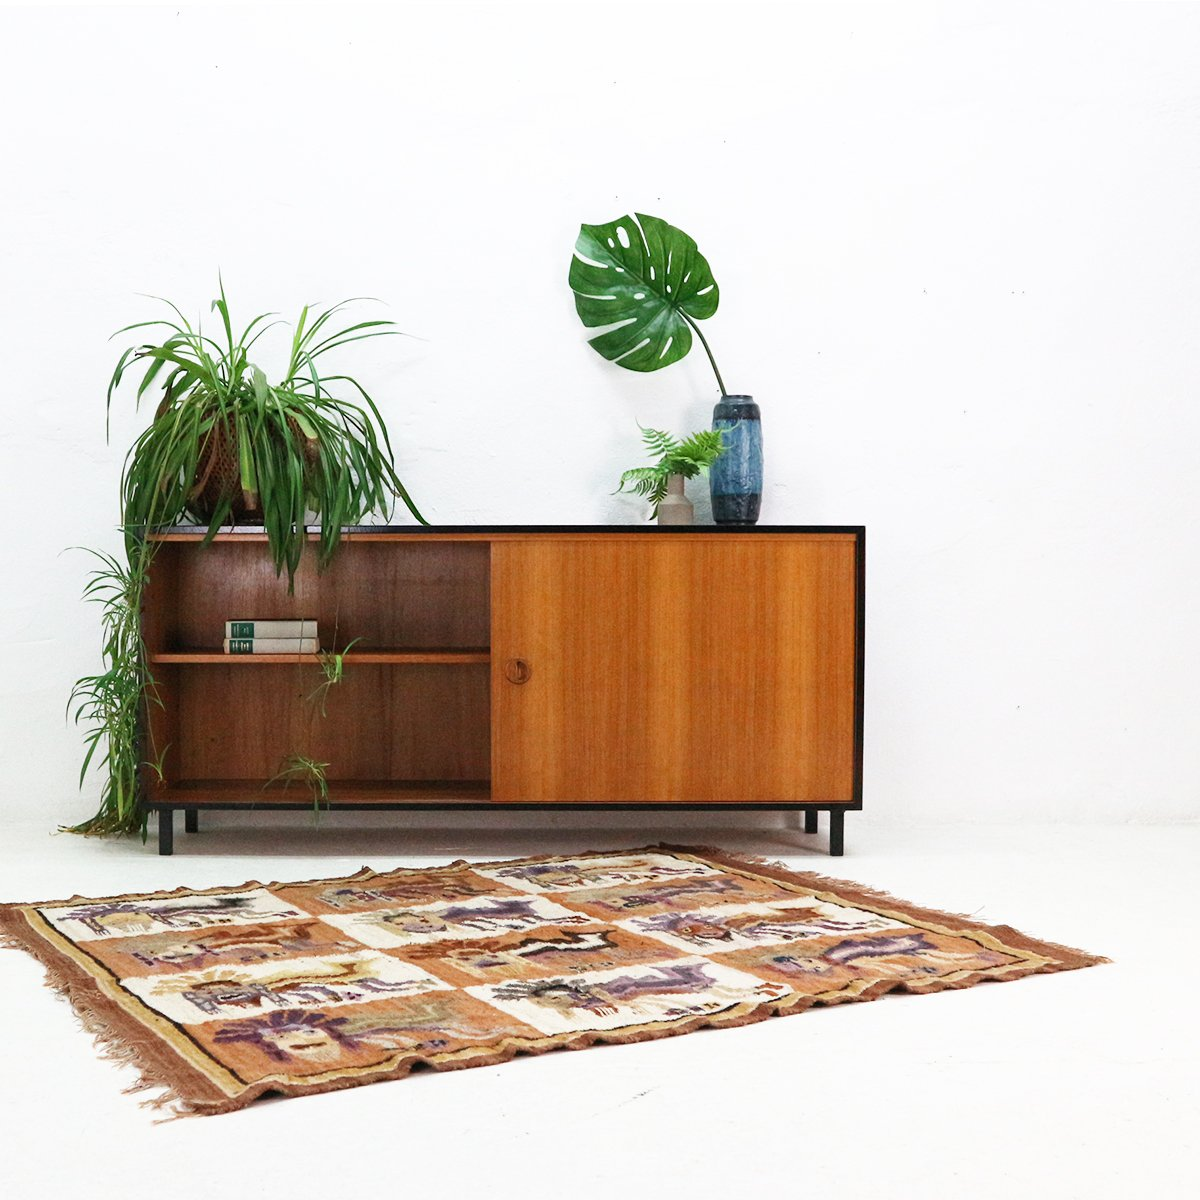 teak veneer sideboard from musterring 1960s for sale at. Black Bedroom Furniture Sets. Home Design Ideas